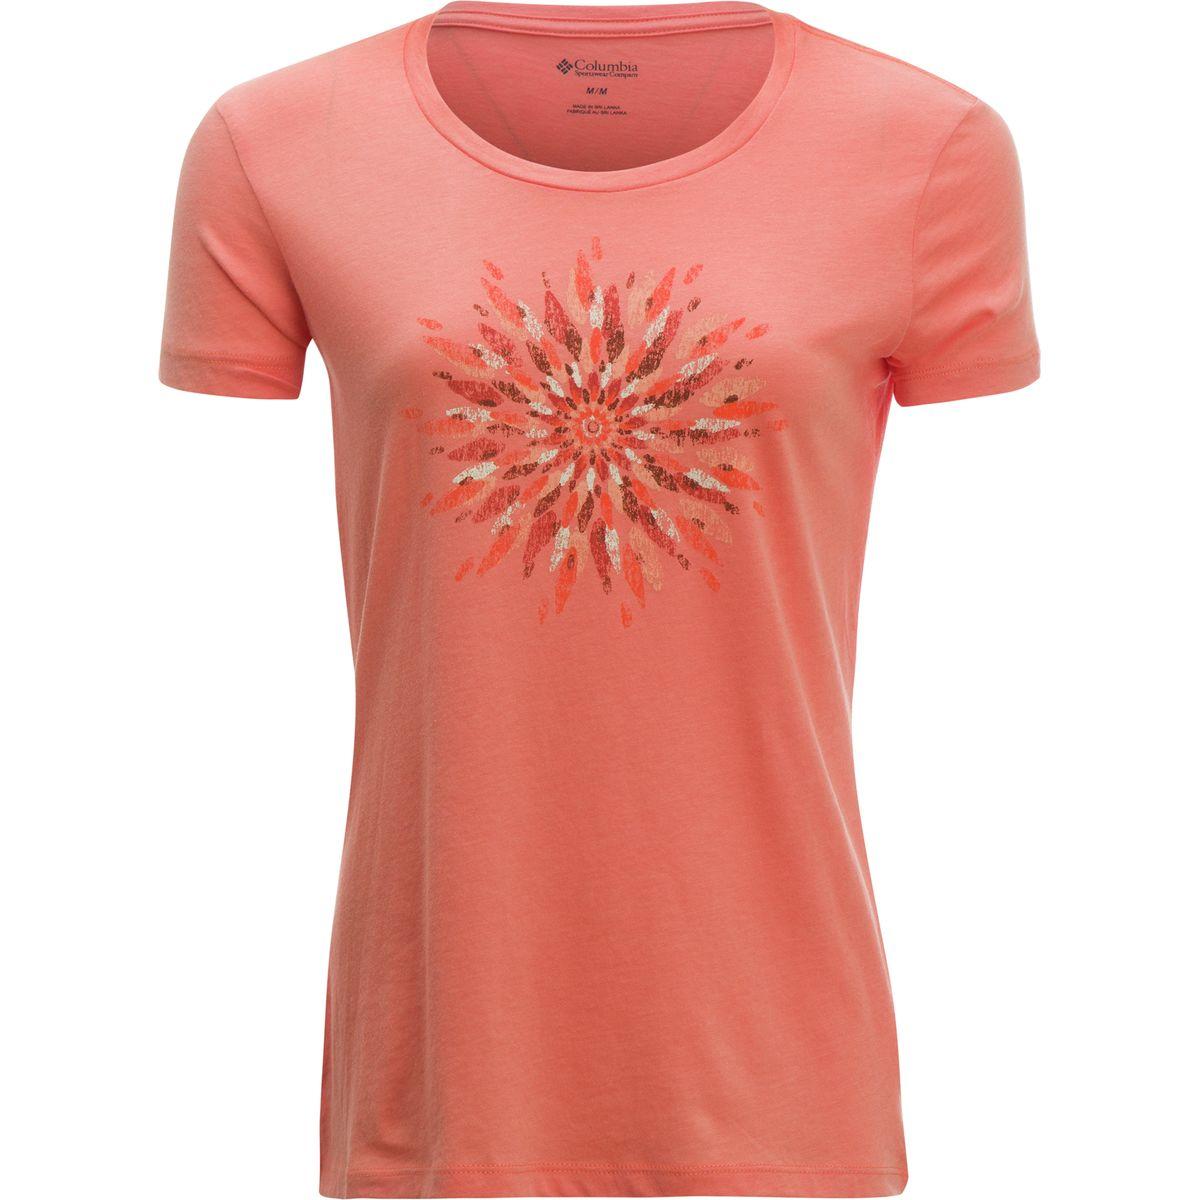 Columbia Daisy Day Medallion T-Shirt - Women